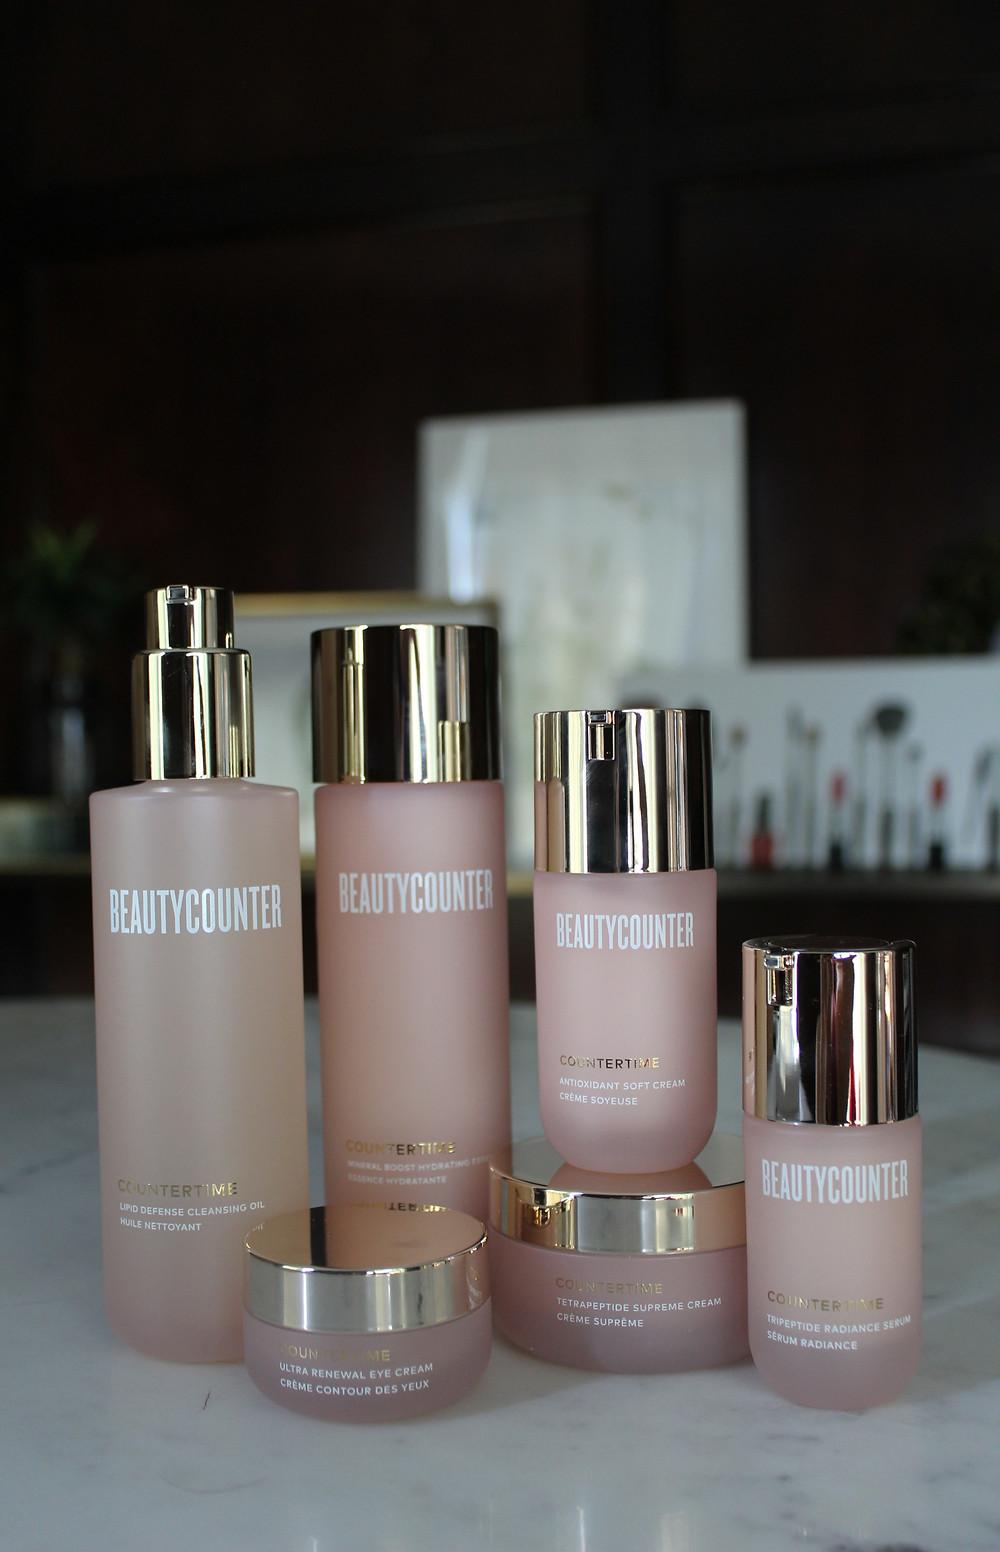 Beautycounter Countertime Collection | Kate Markovitz